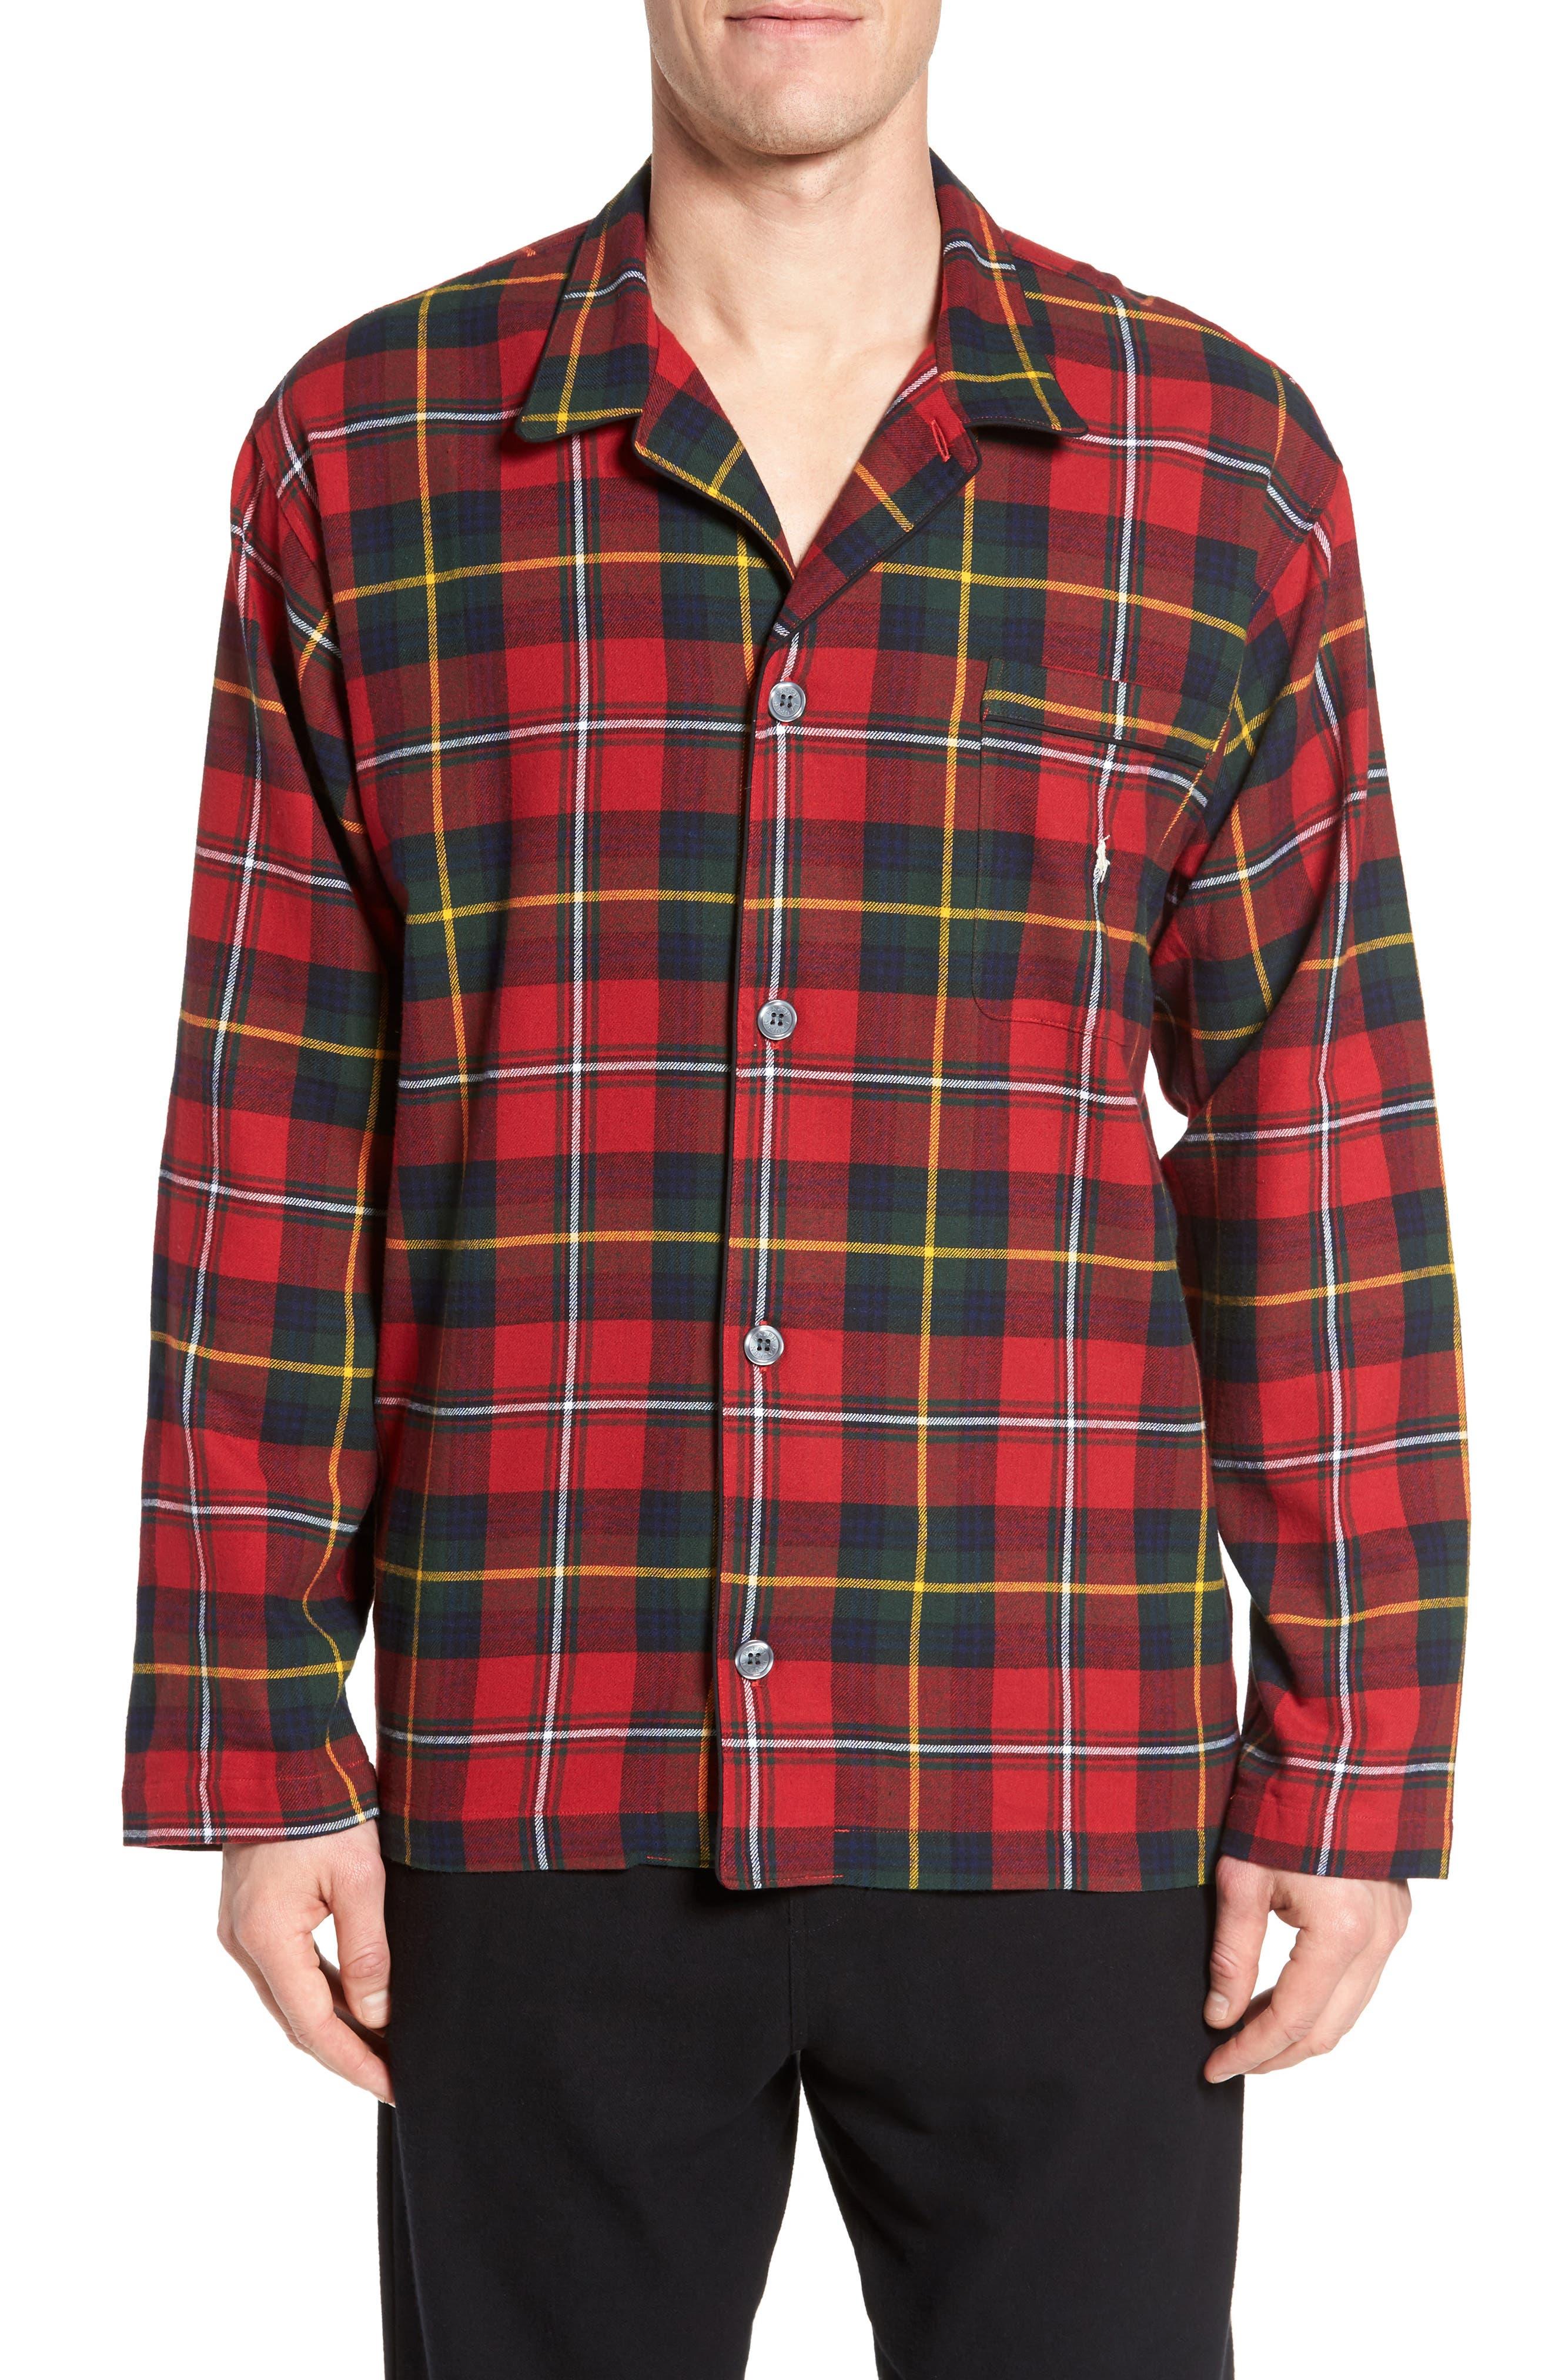 Polo Ralph Lauren Flannel Pajama Shirt,                         Main,                         color, Andrew Plaid/ Black/ Cream